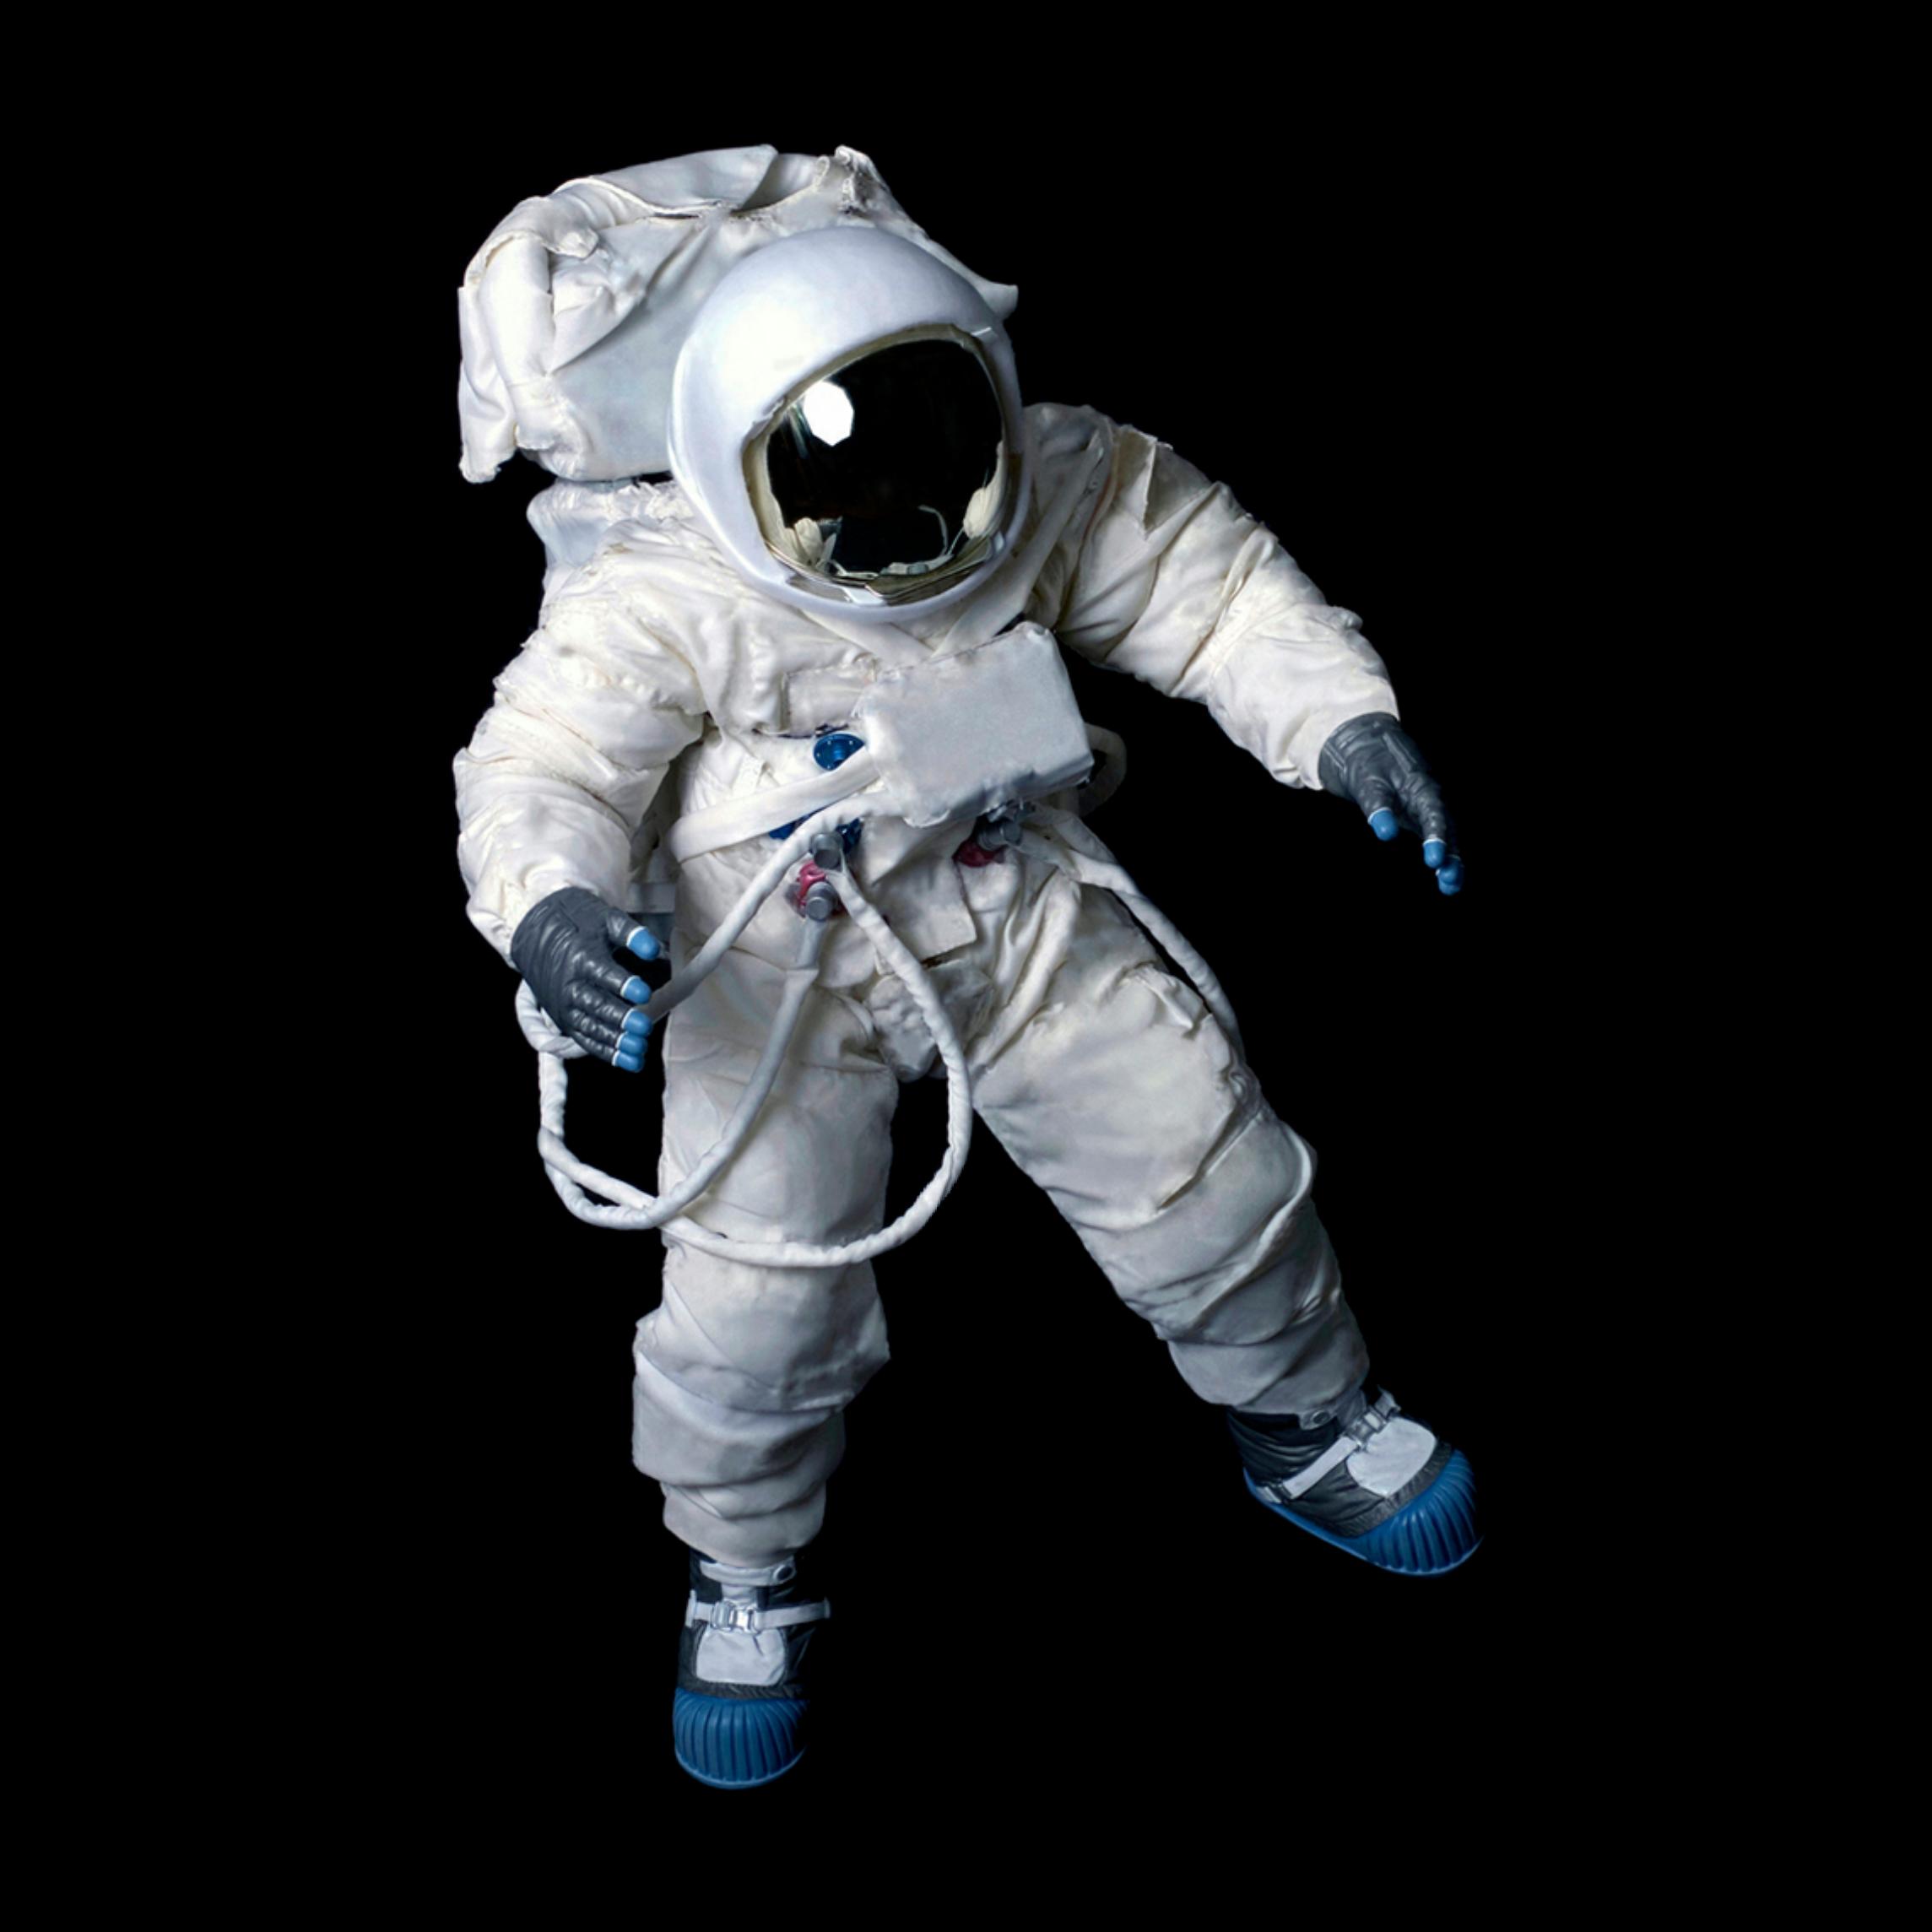 astronaut - Sticker by Reggie7